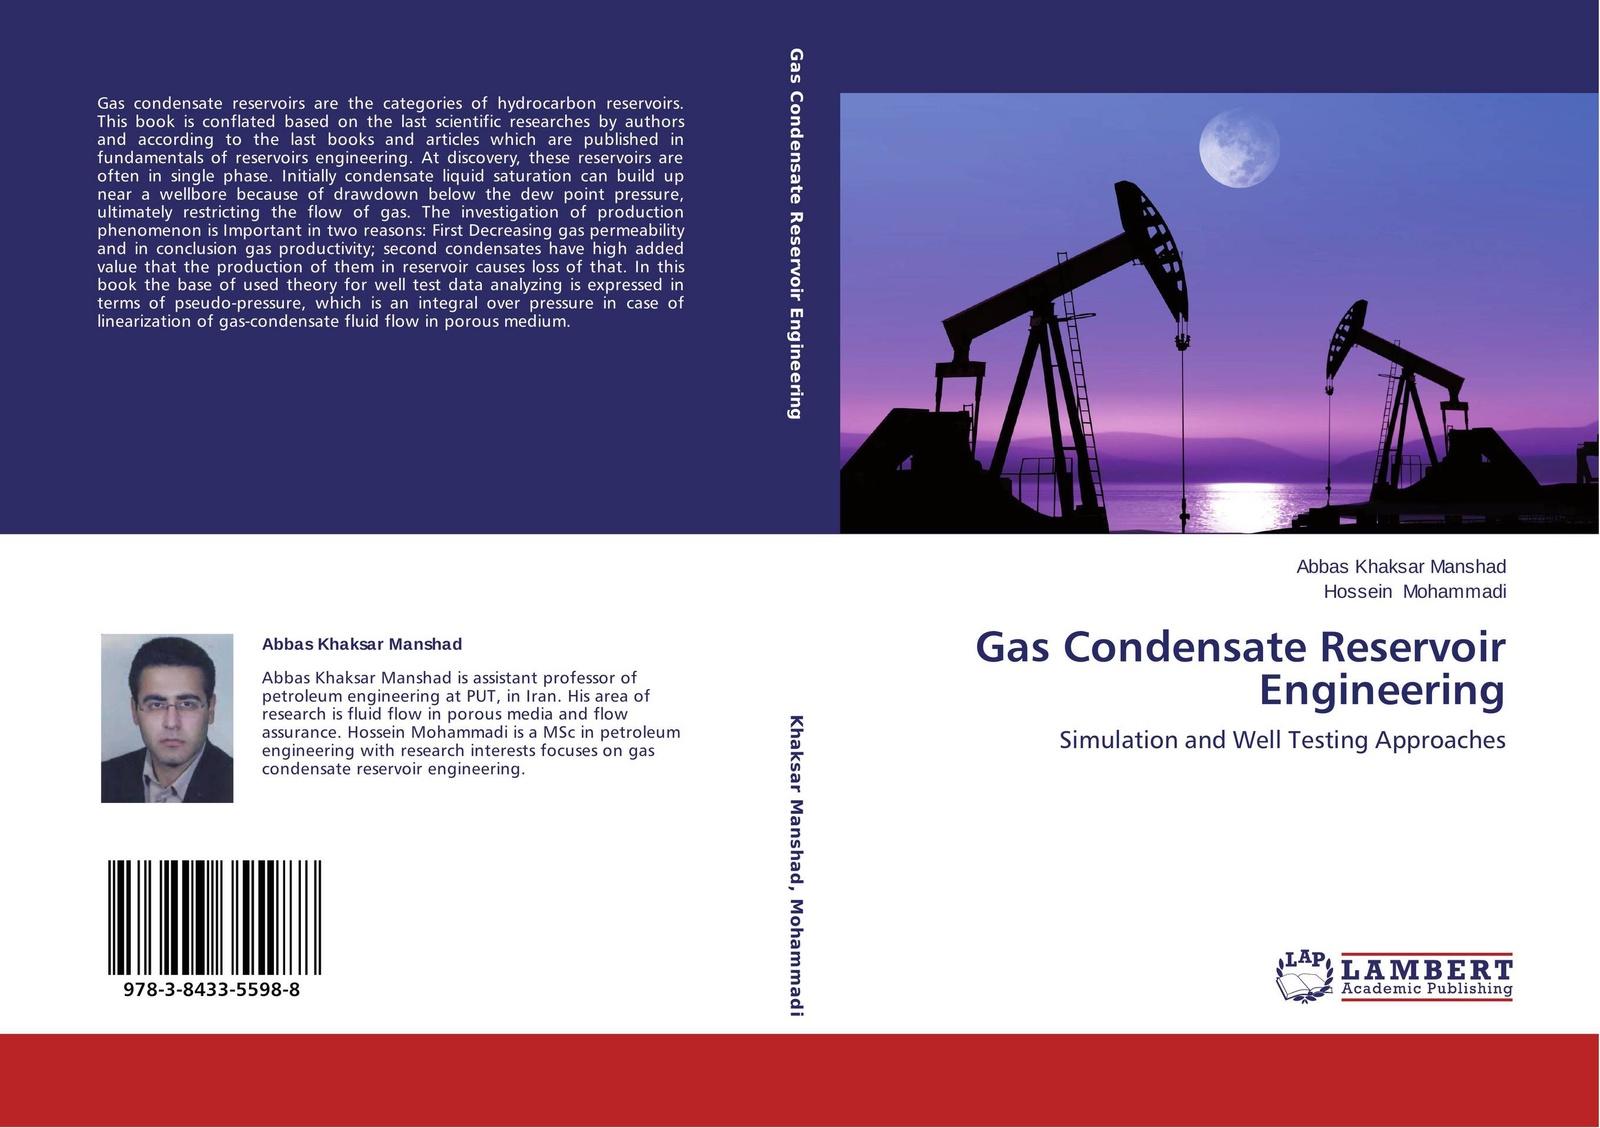 Abbas Khaksar Manshad and Hossein Mohammadi Gas Condensate Reservoir Engineering leonid buryakovsky fundamentals of the petrophysics of oil and gas reservoirs